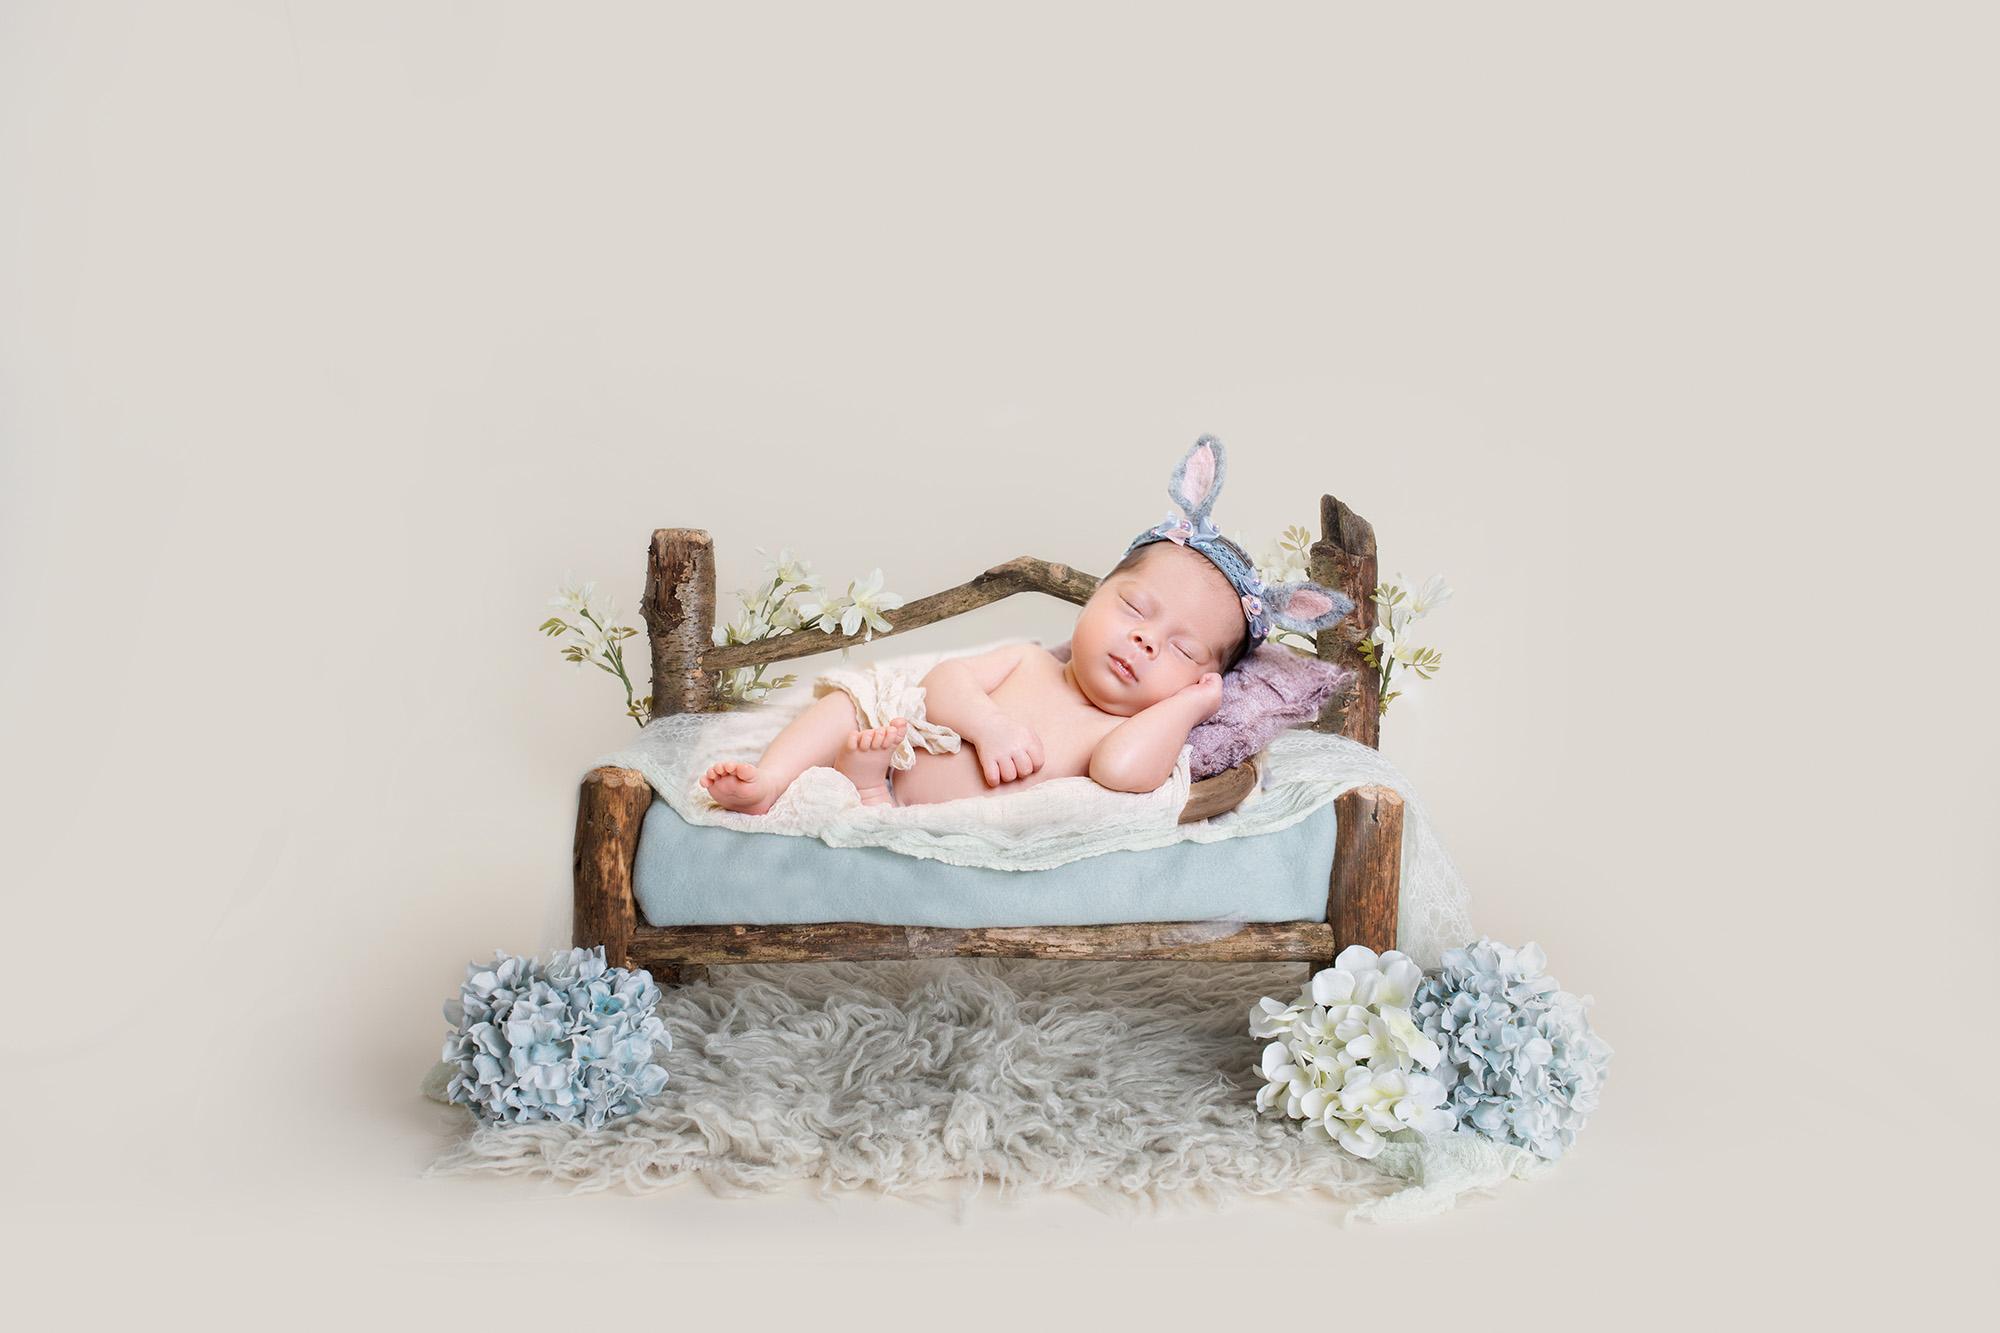 newborn photography floral prop 4